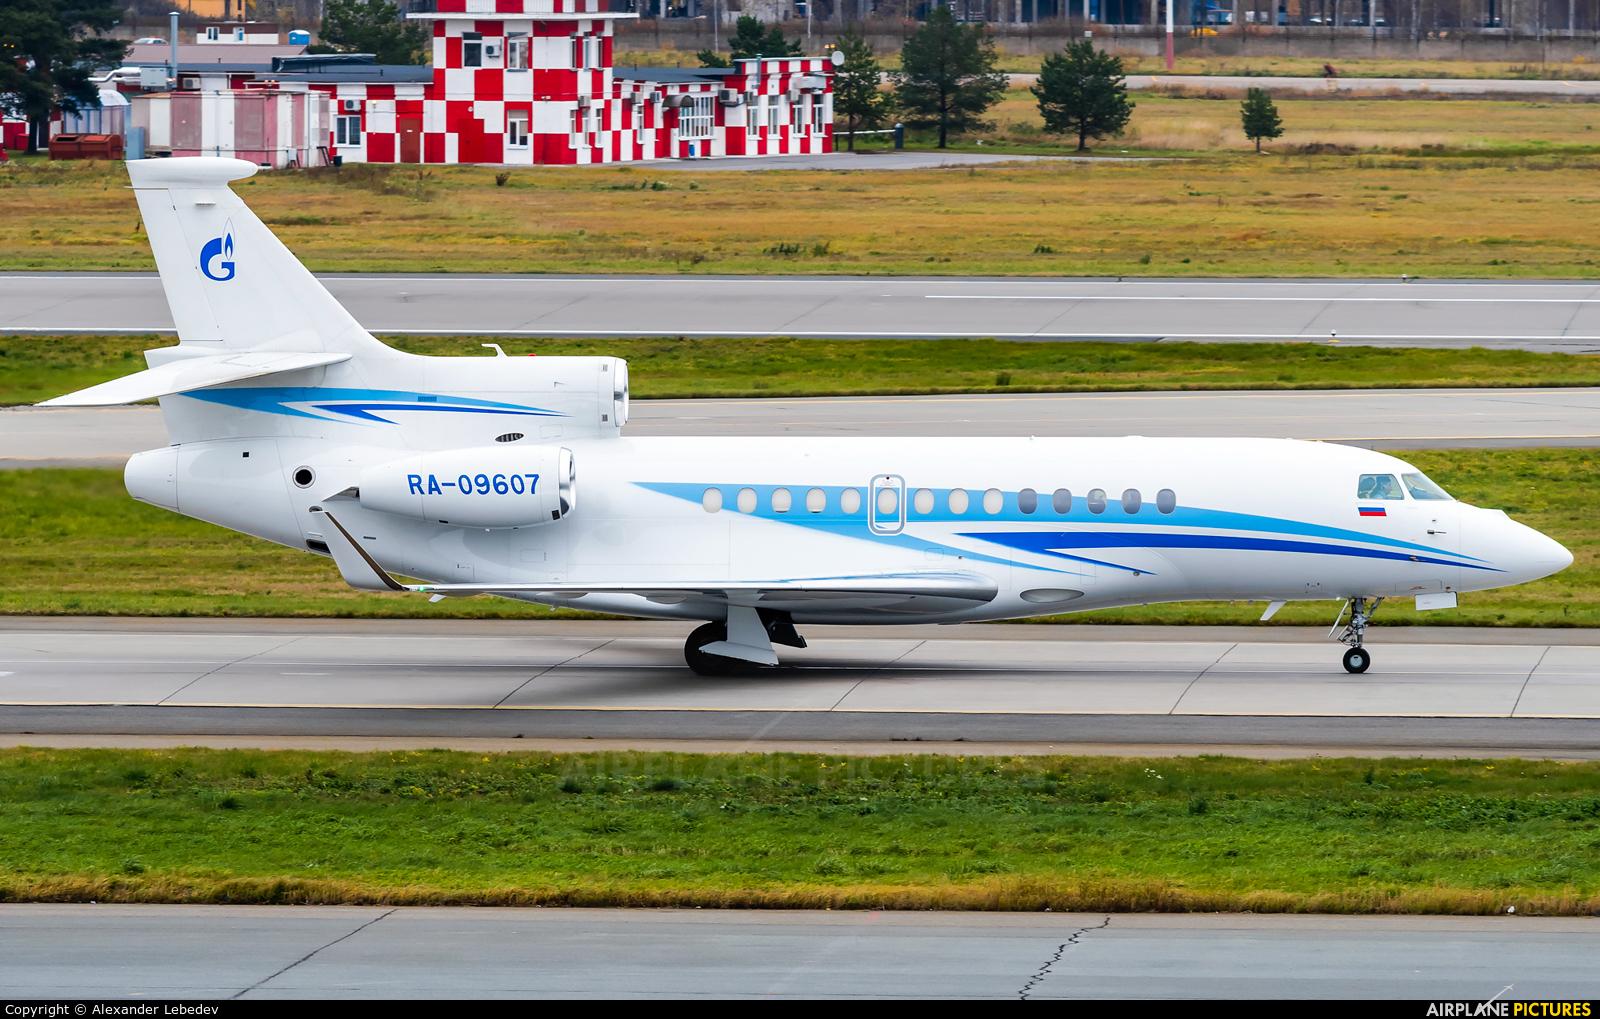 Gazpromavia RA-09607 aircraft at St. Petersburg - Pulkovo